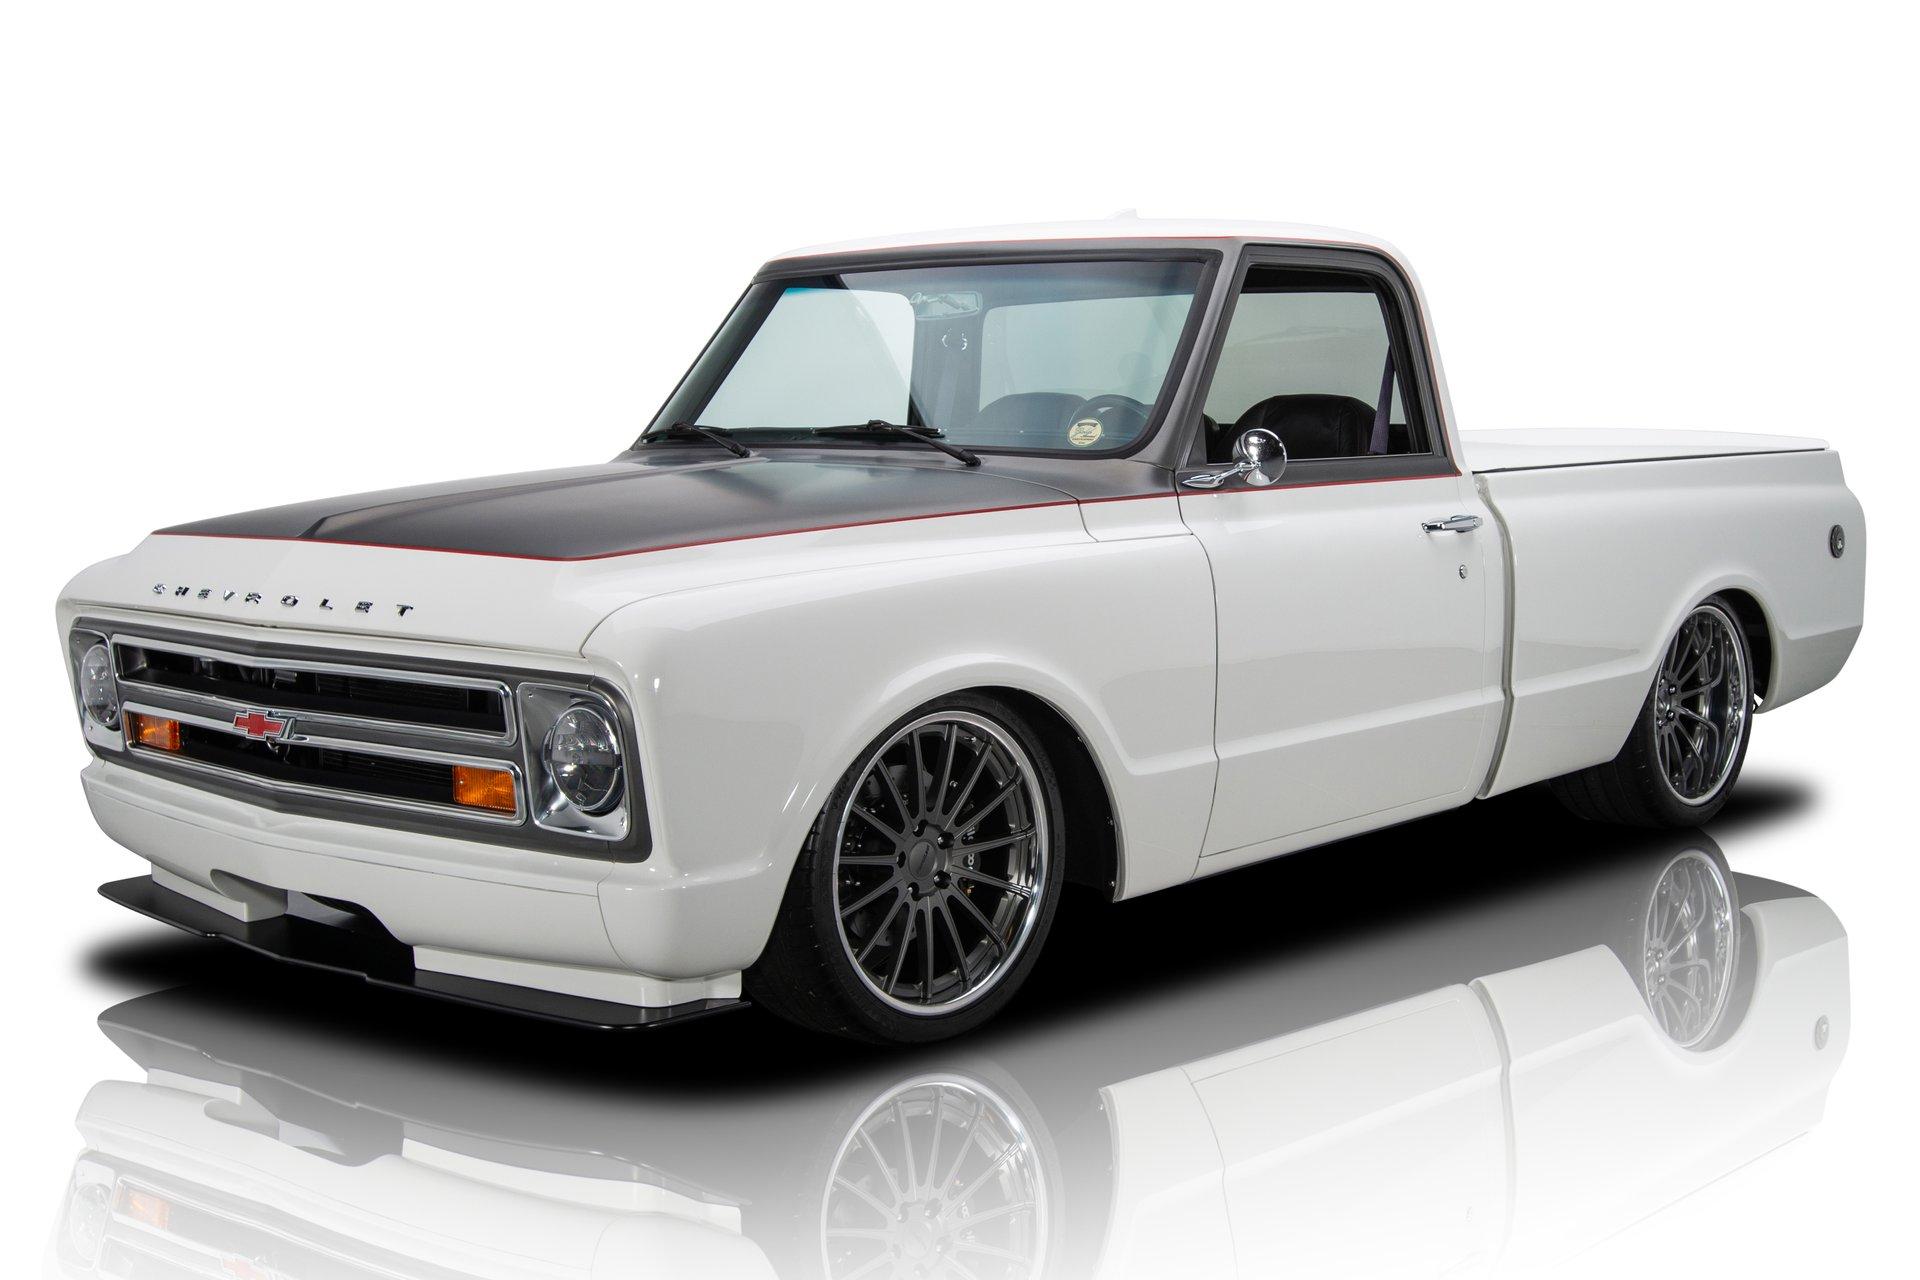 1968 chevrolet c10 pickup truck